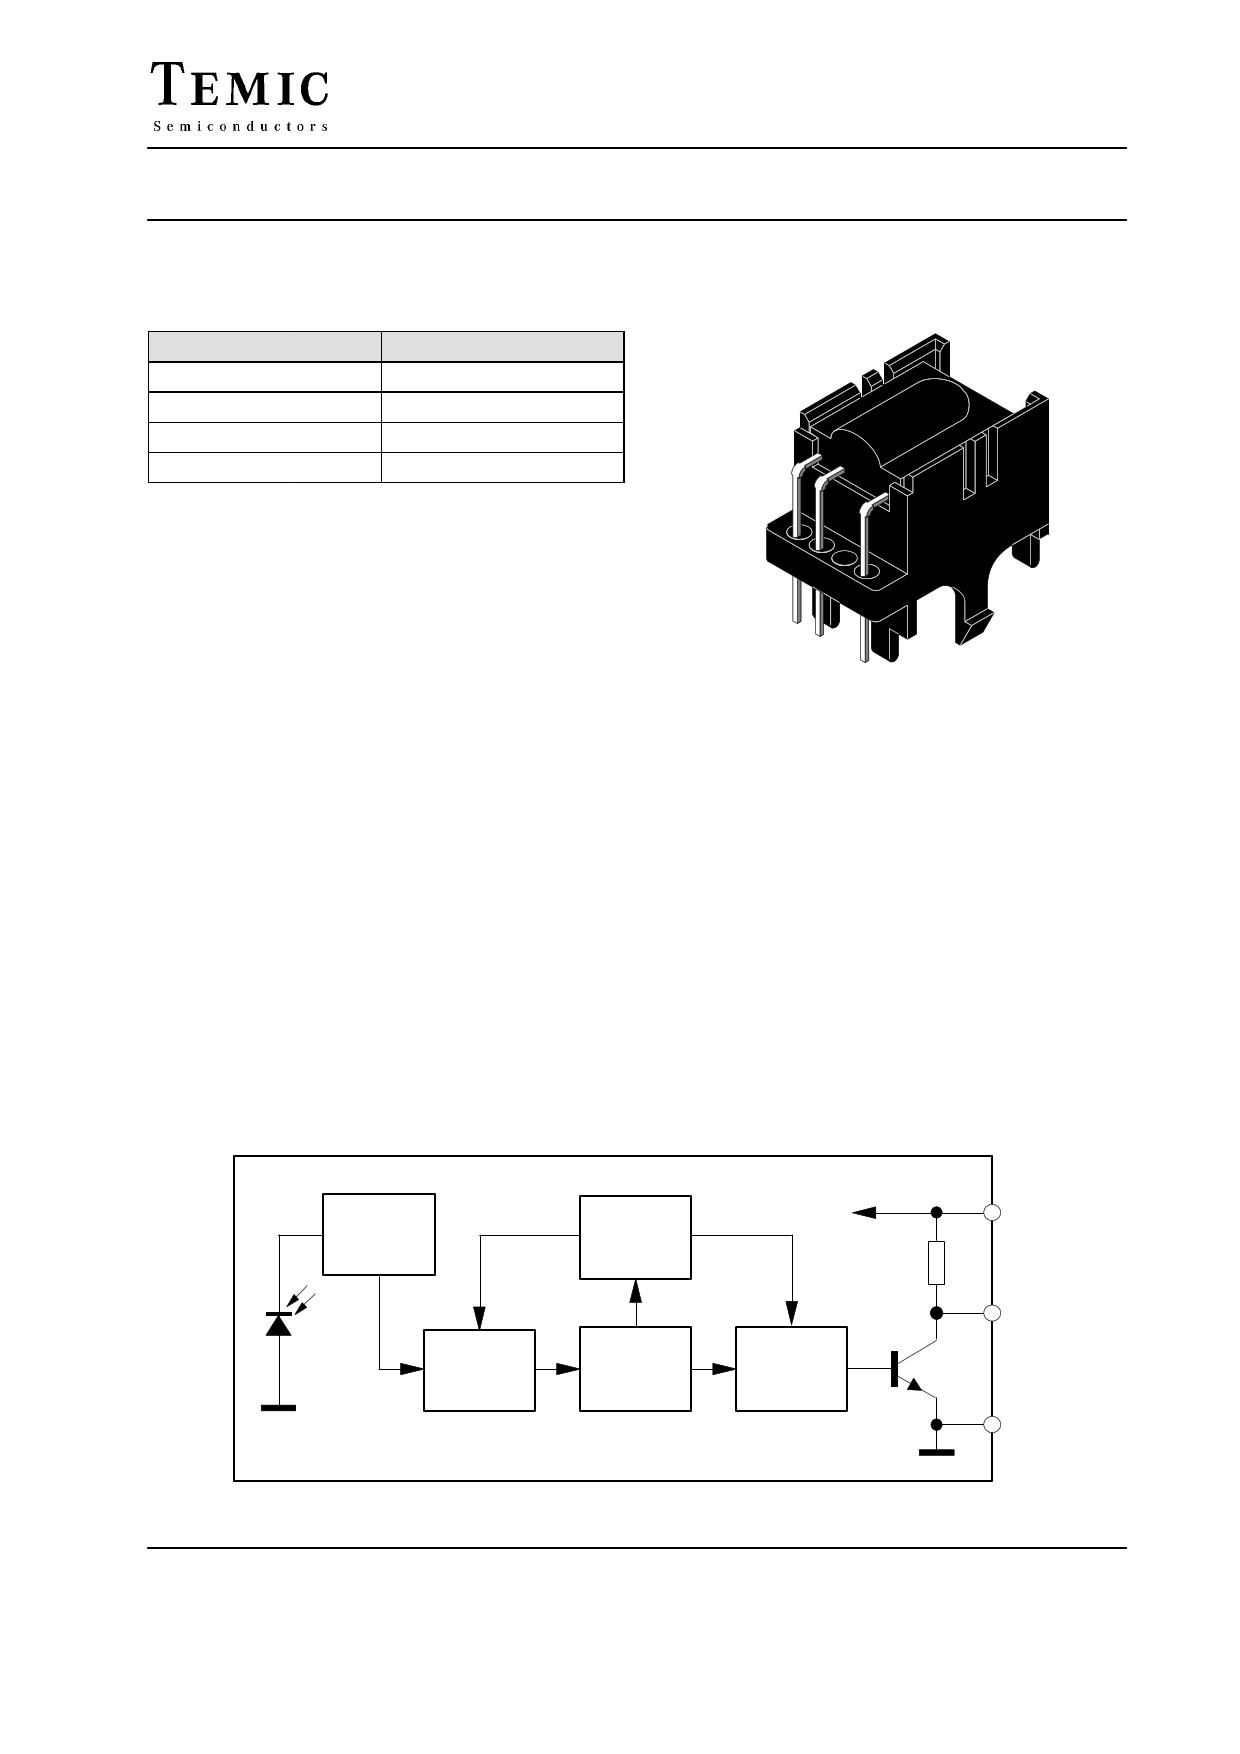 TFMT5370 데이터시트 및 TFMT5370 PDF